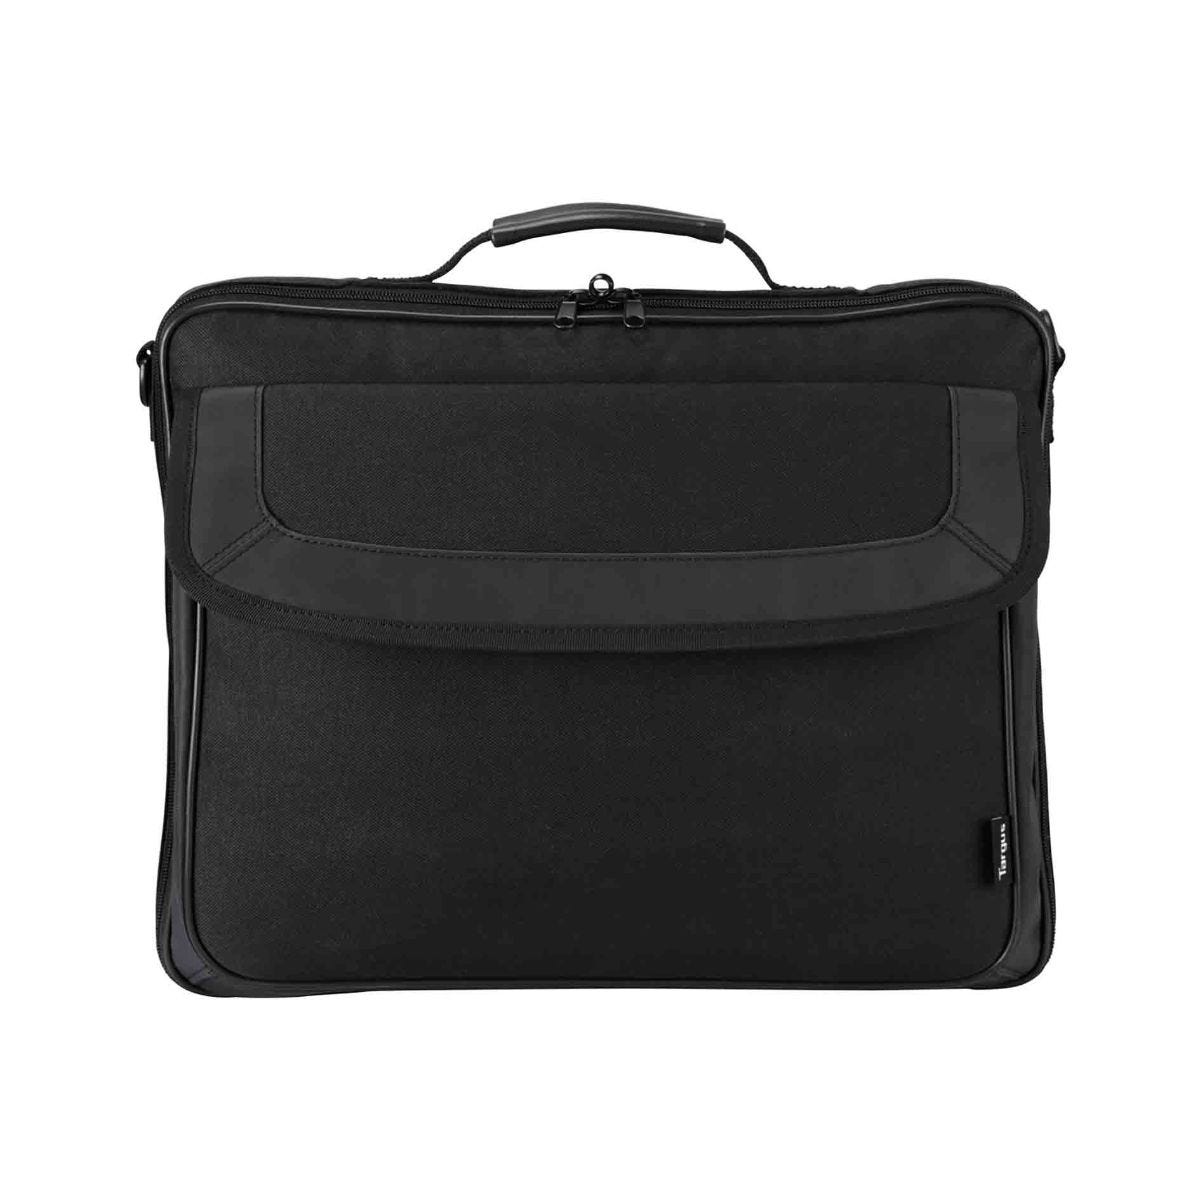 Image of Targus Classic Clamshell Laptop Bag 15-15.6 Inch Black, Black